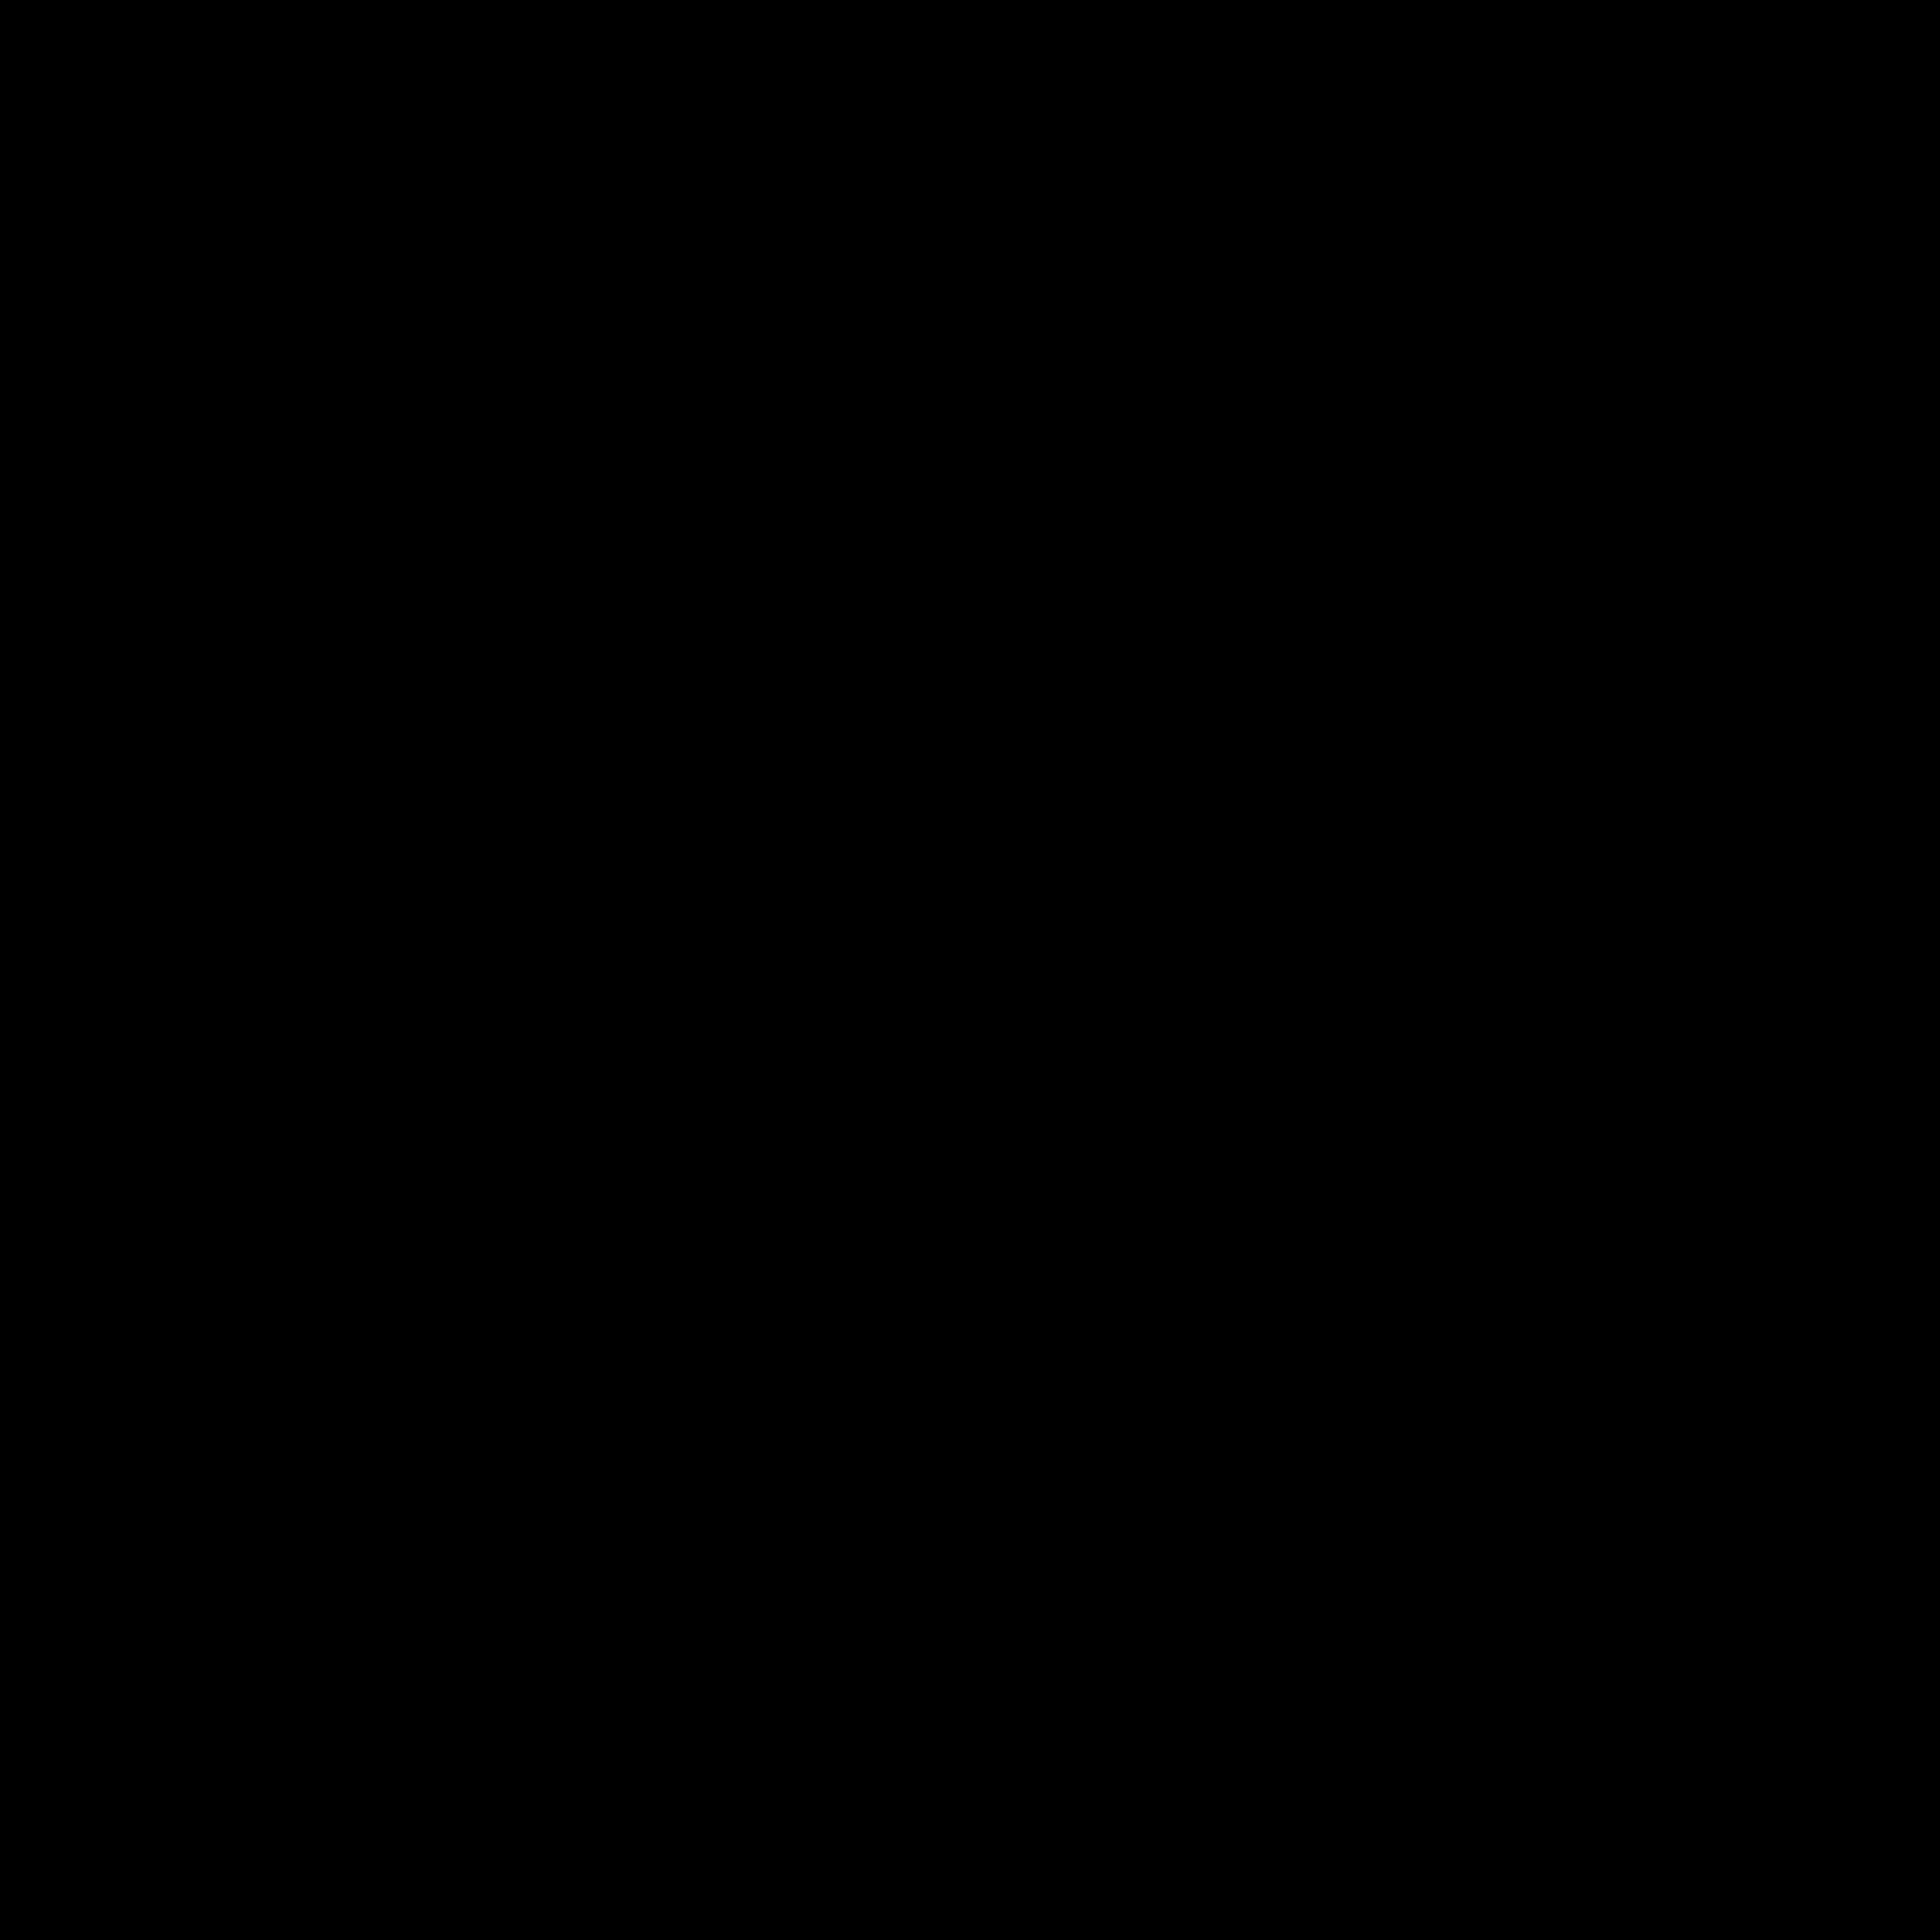 Ferguson Logo PNG Transparent & SVG Vector - Freebie Supply